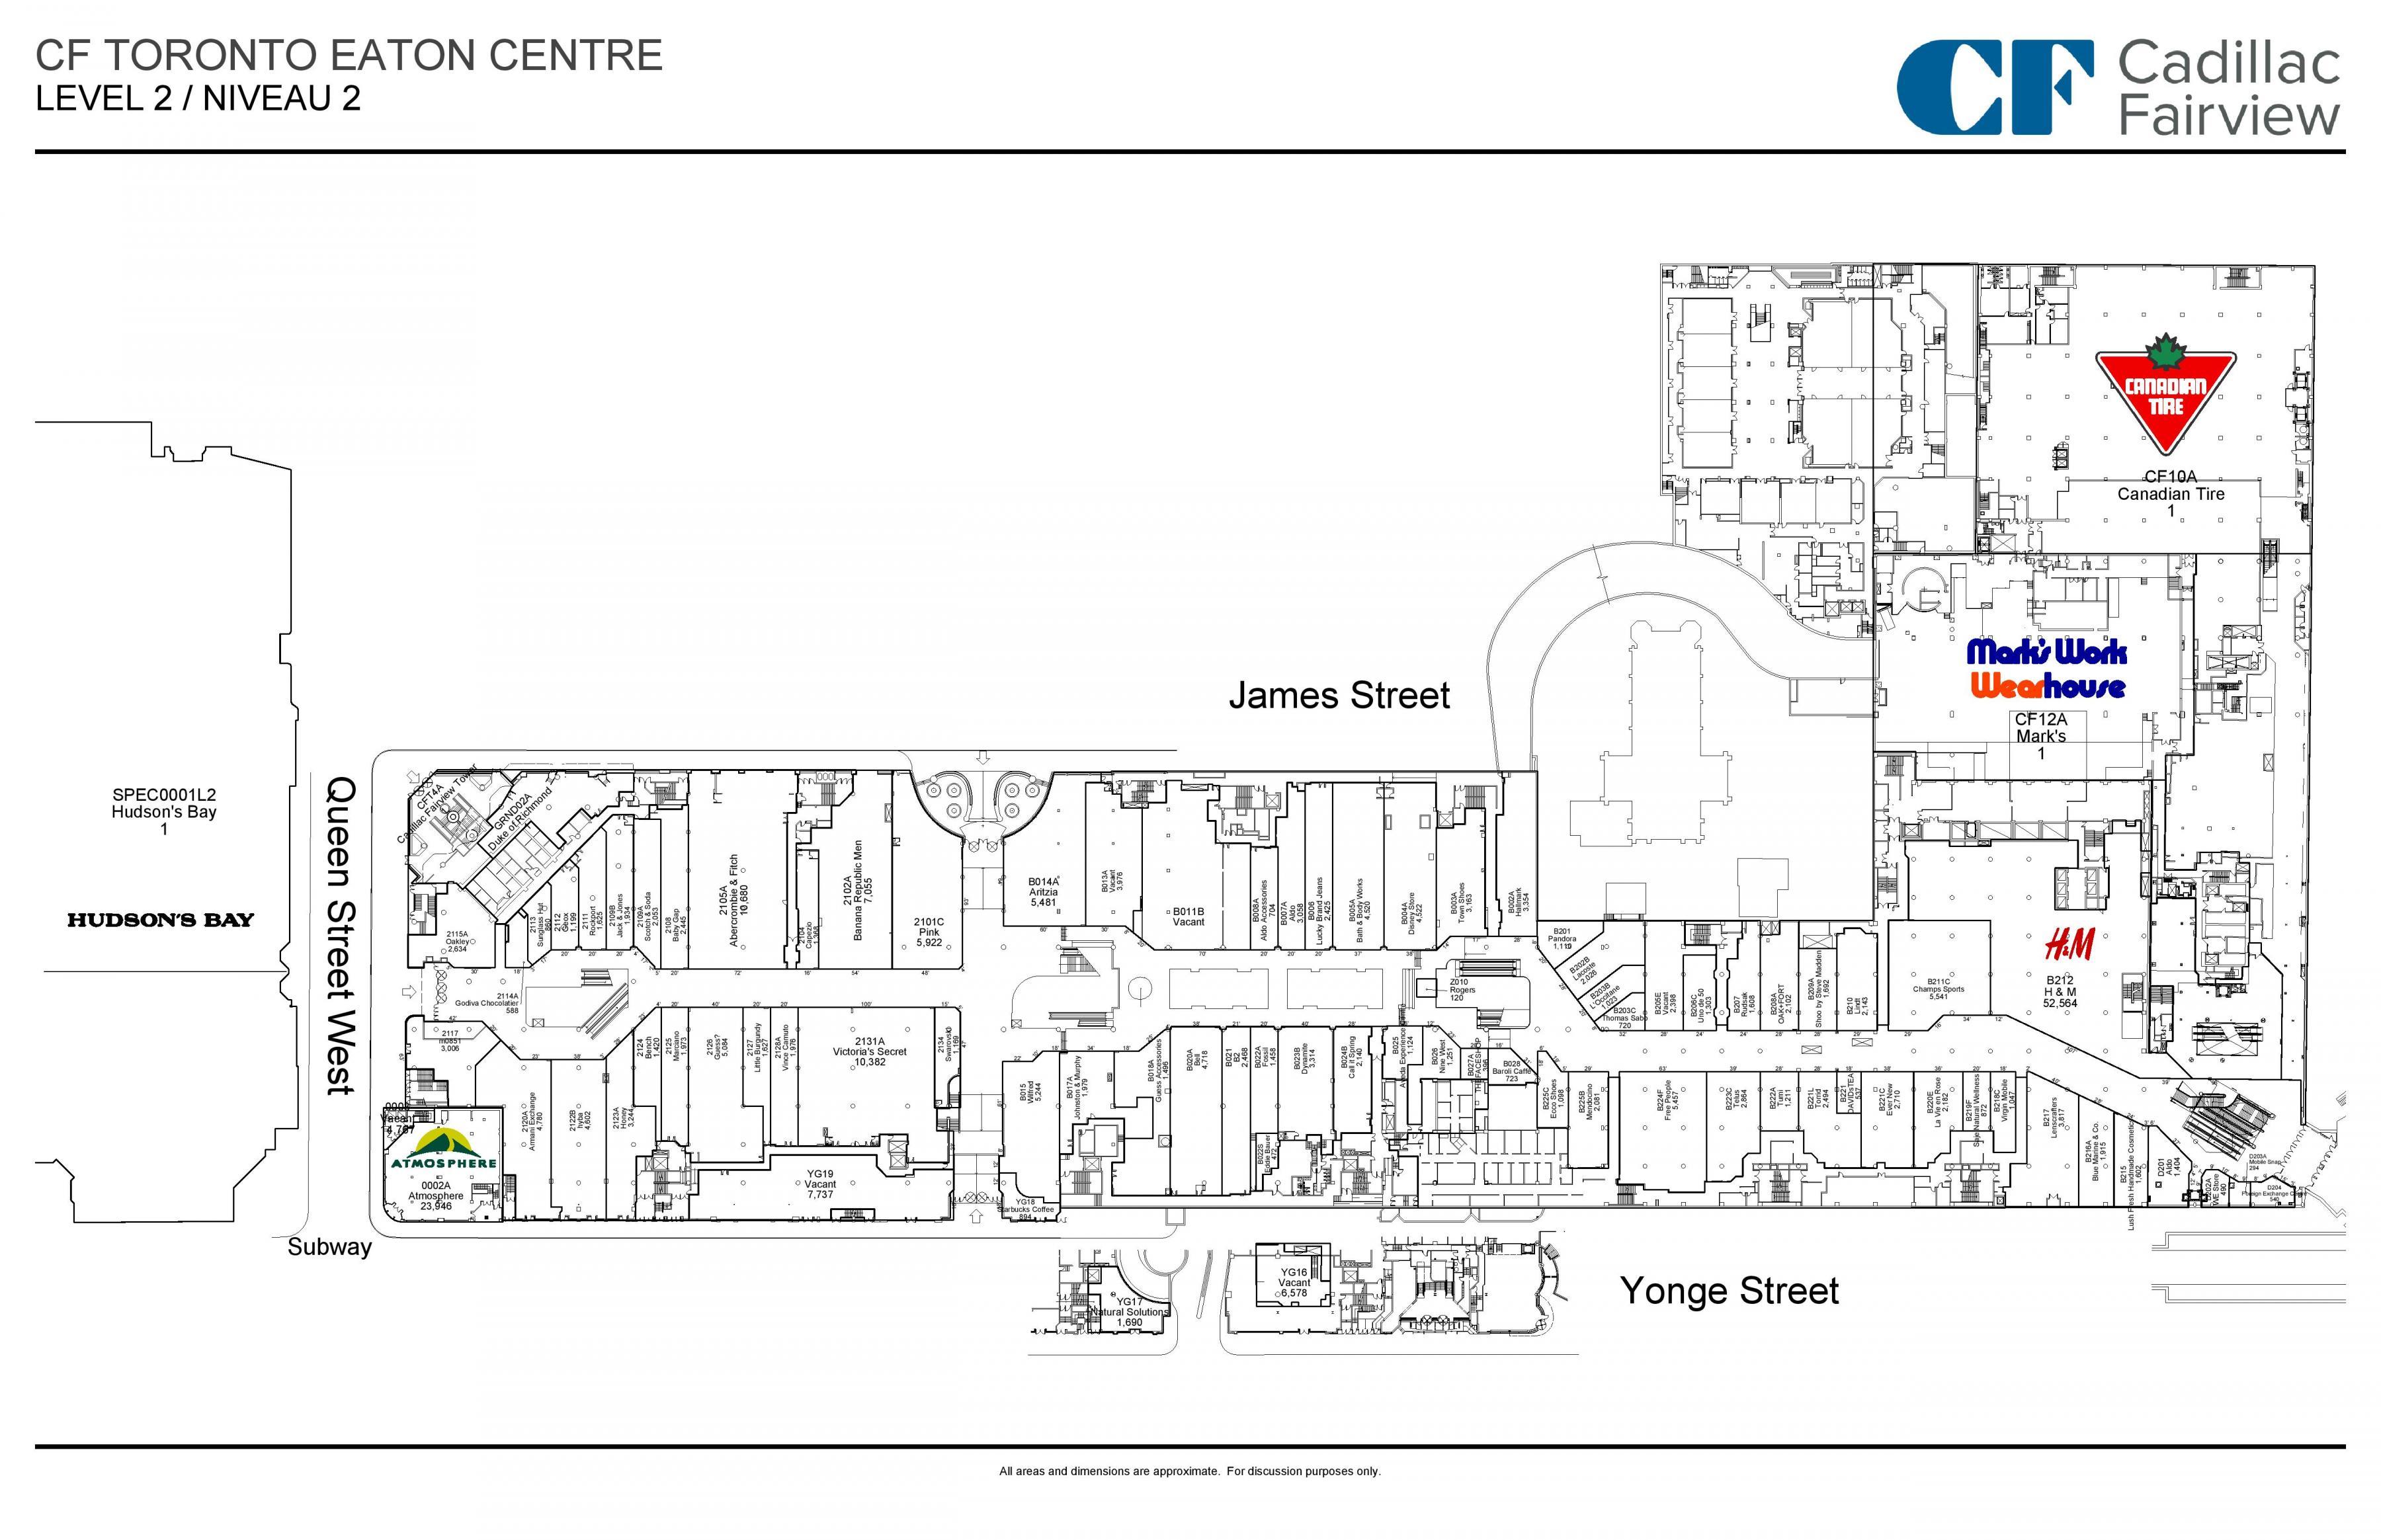 Toronto Spist Center Plan 2 Kort Kort Over Toronto Spist Center